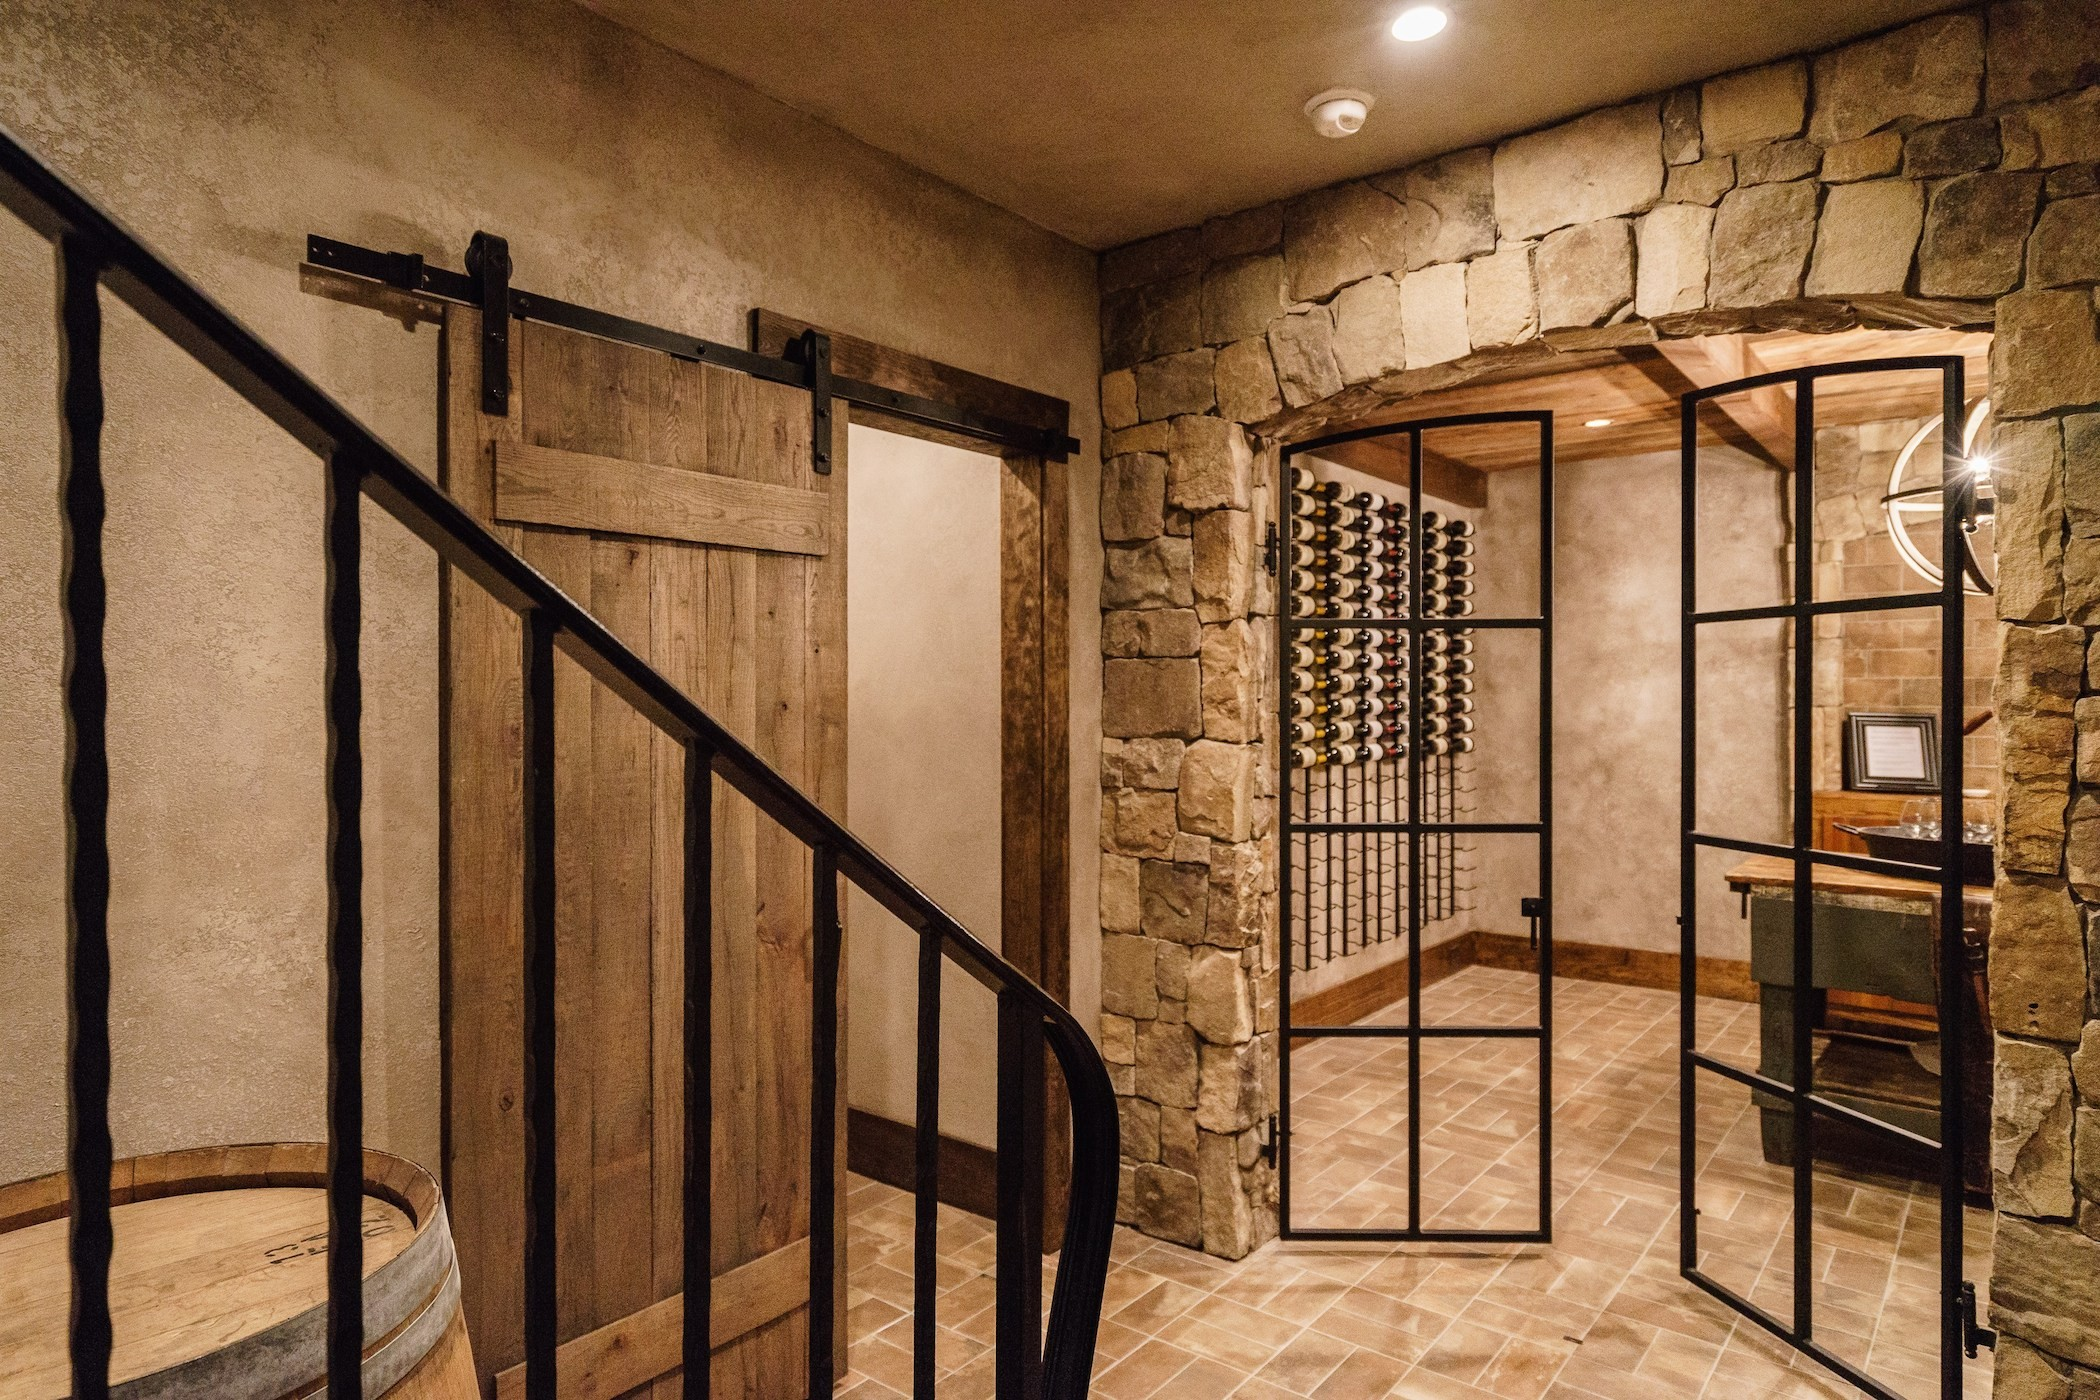 031_Wine_Cellar20170522103019